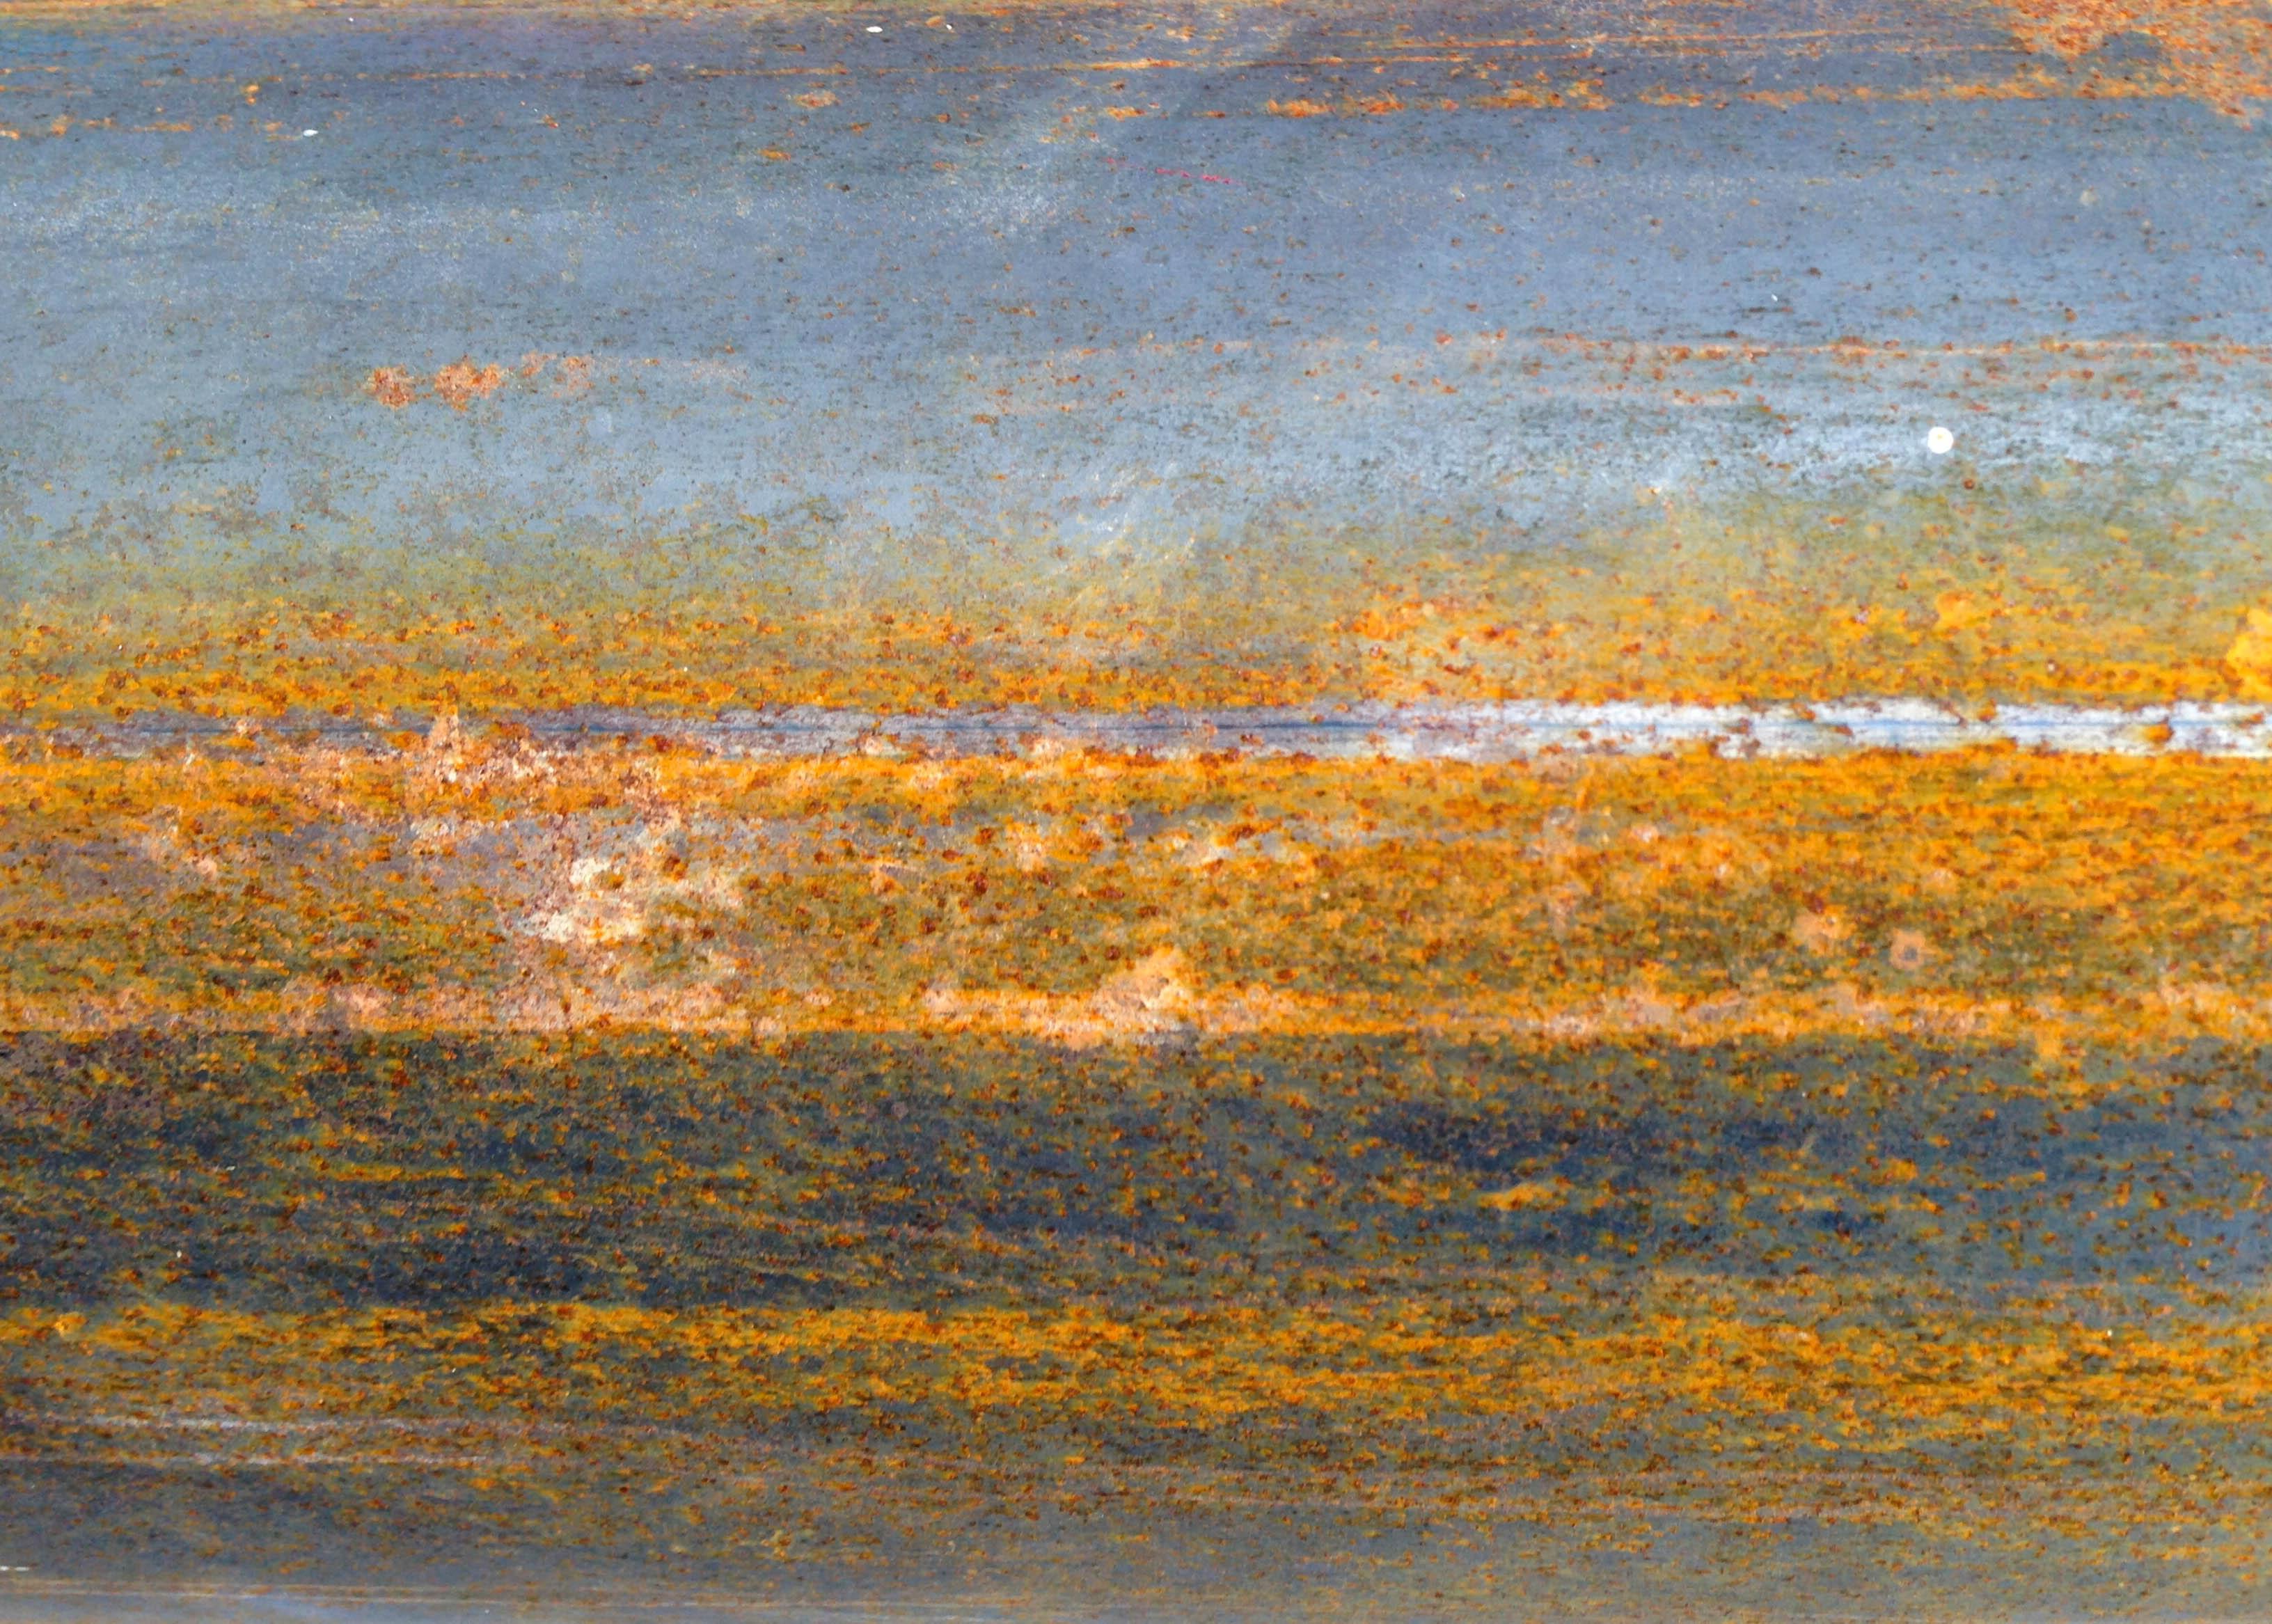 Rusted metal texture, Backdrop, Rusted, Peeled, Peeling, HQ Photo